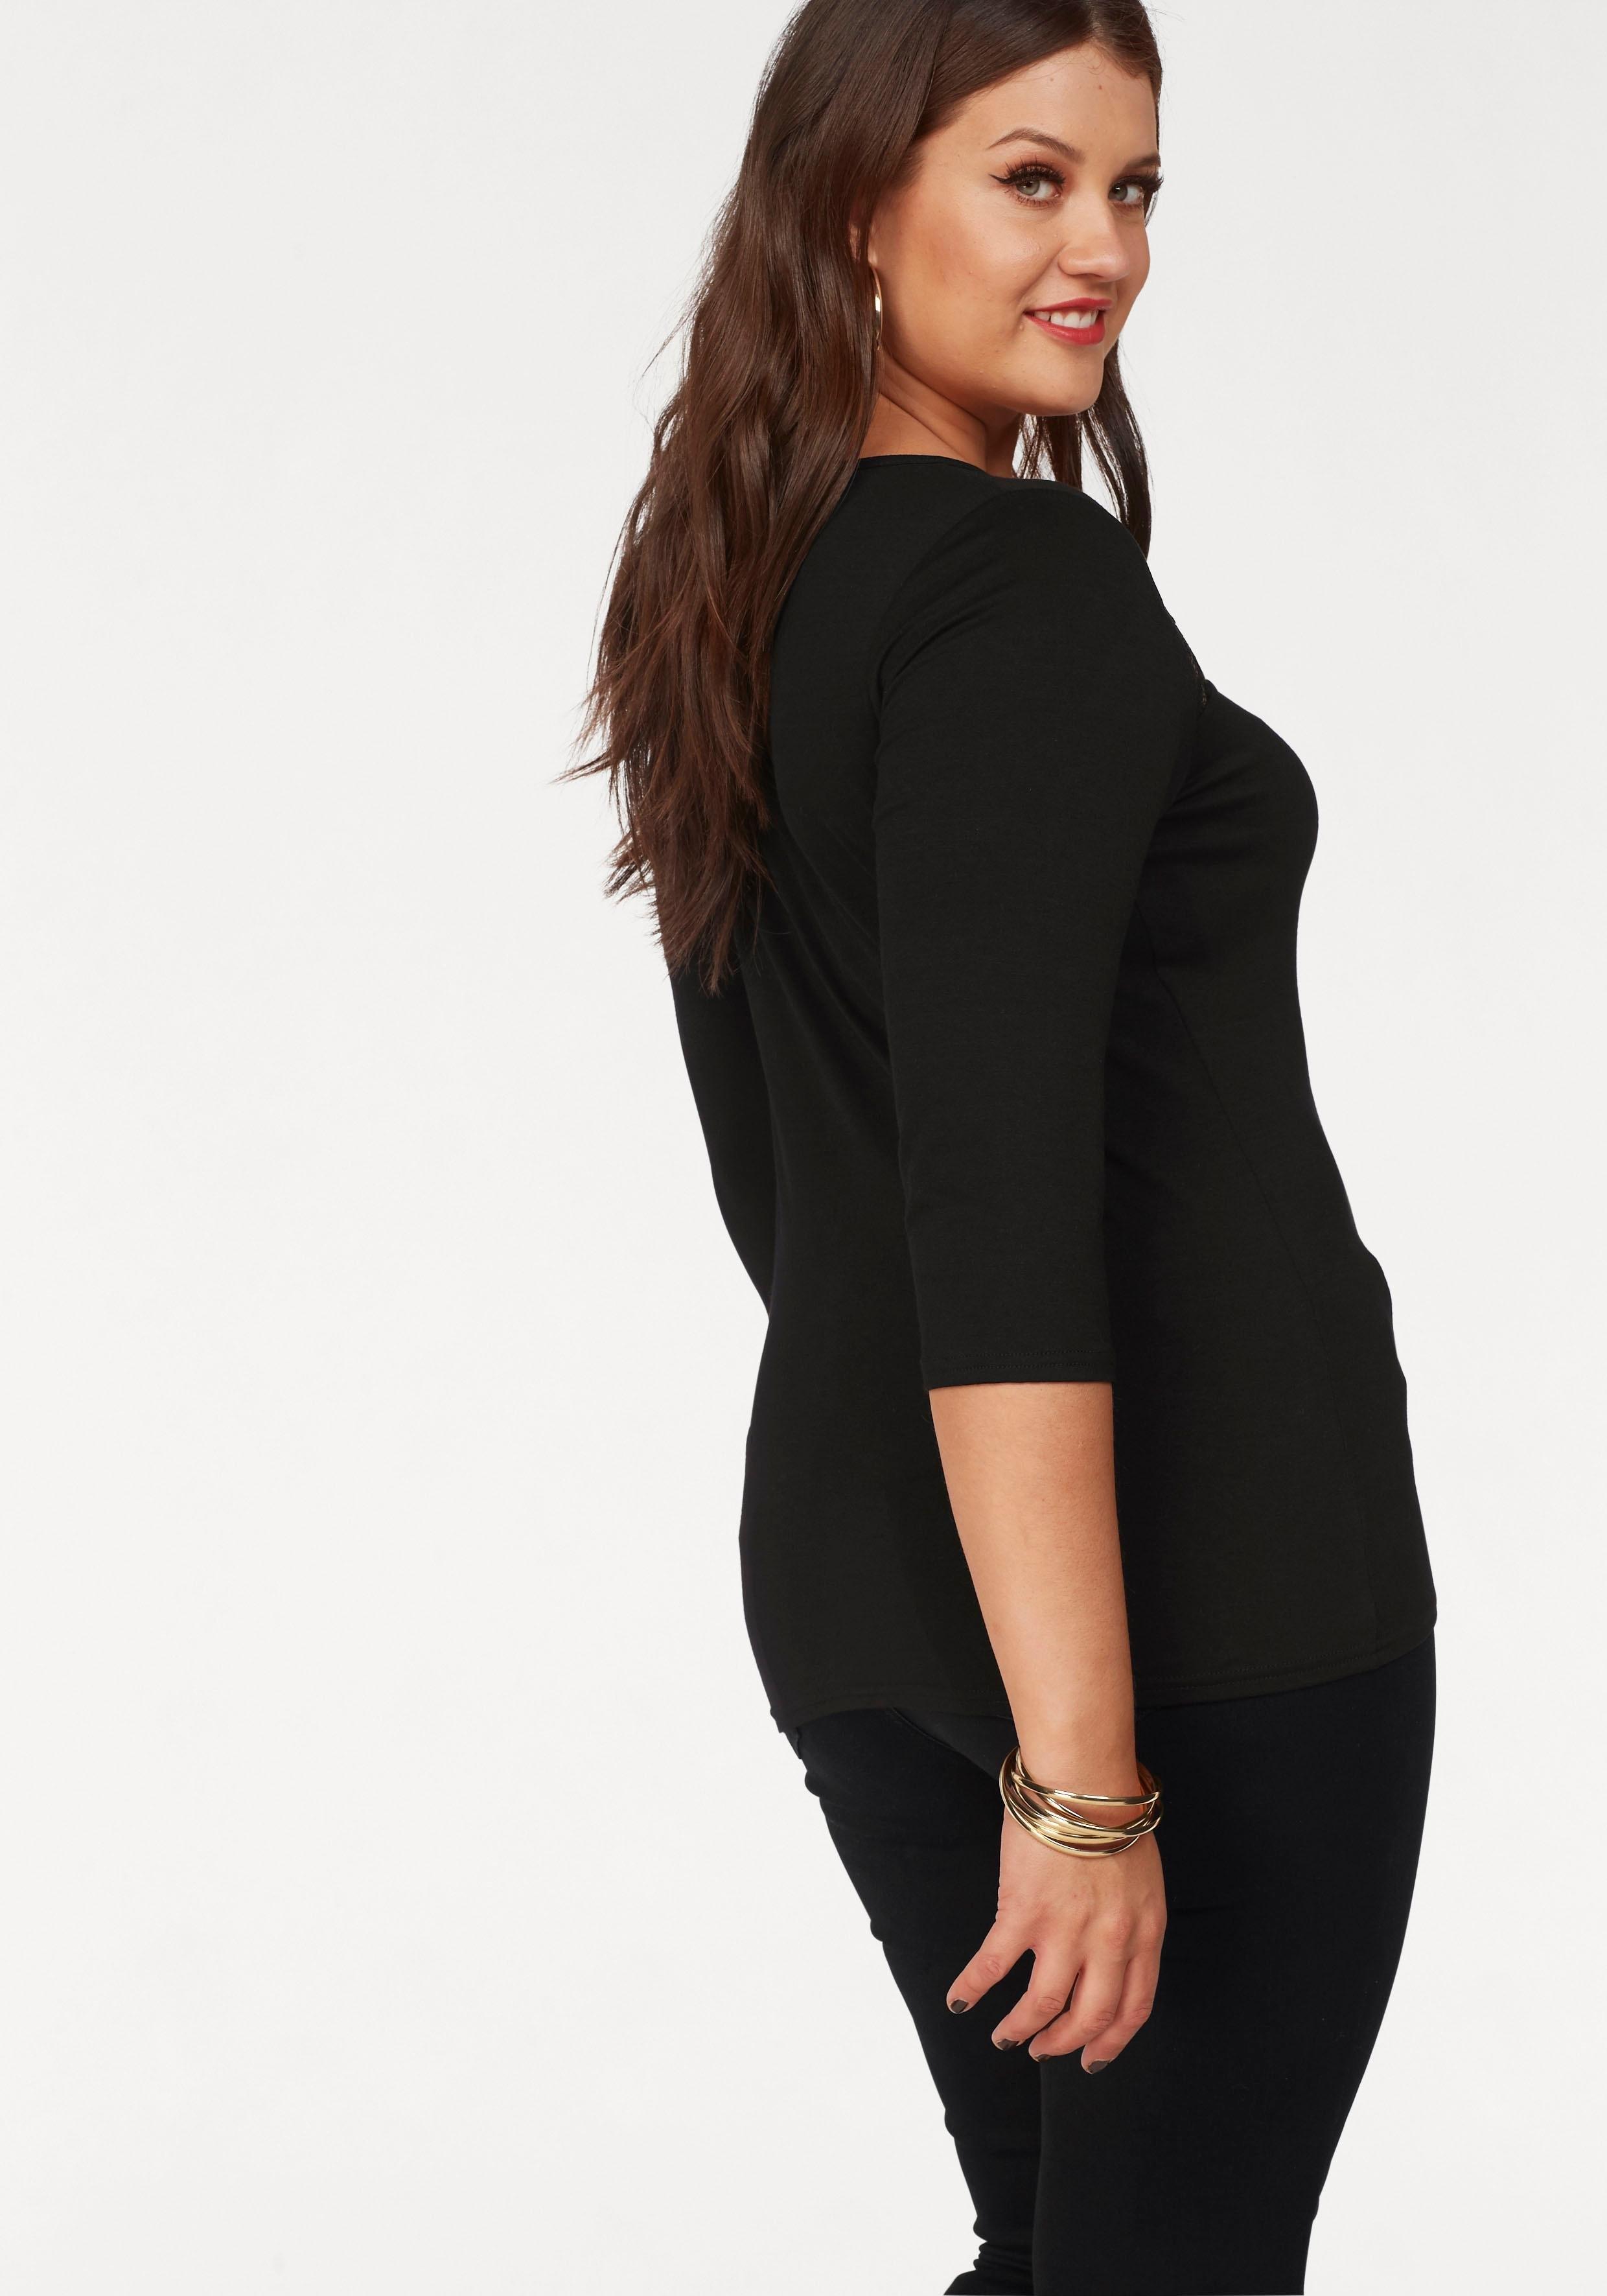 Bestellen Met Melrose Shirt Nu Online Driekwartmouwen MGSVLzpqU